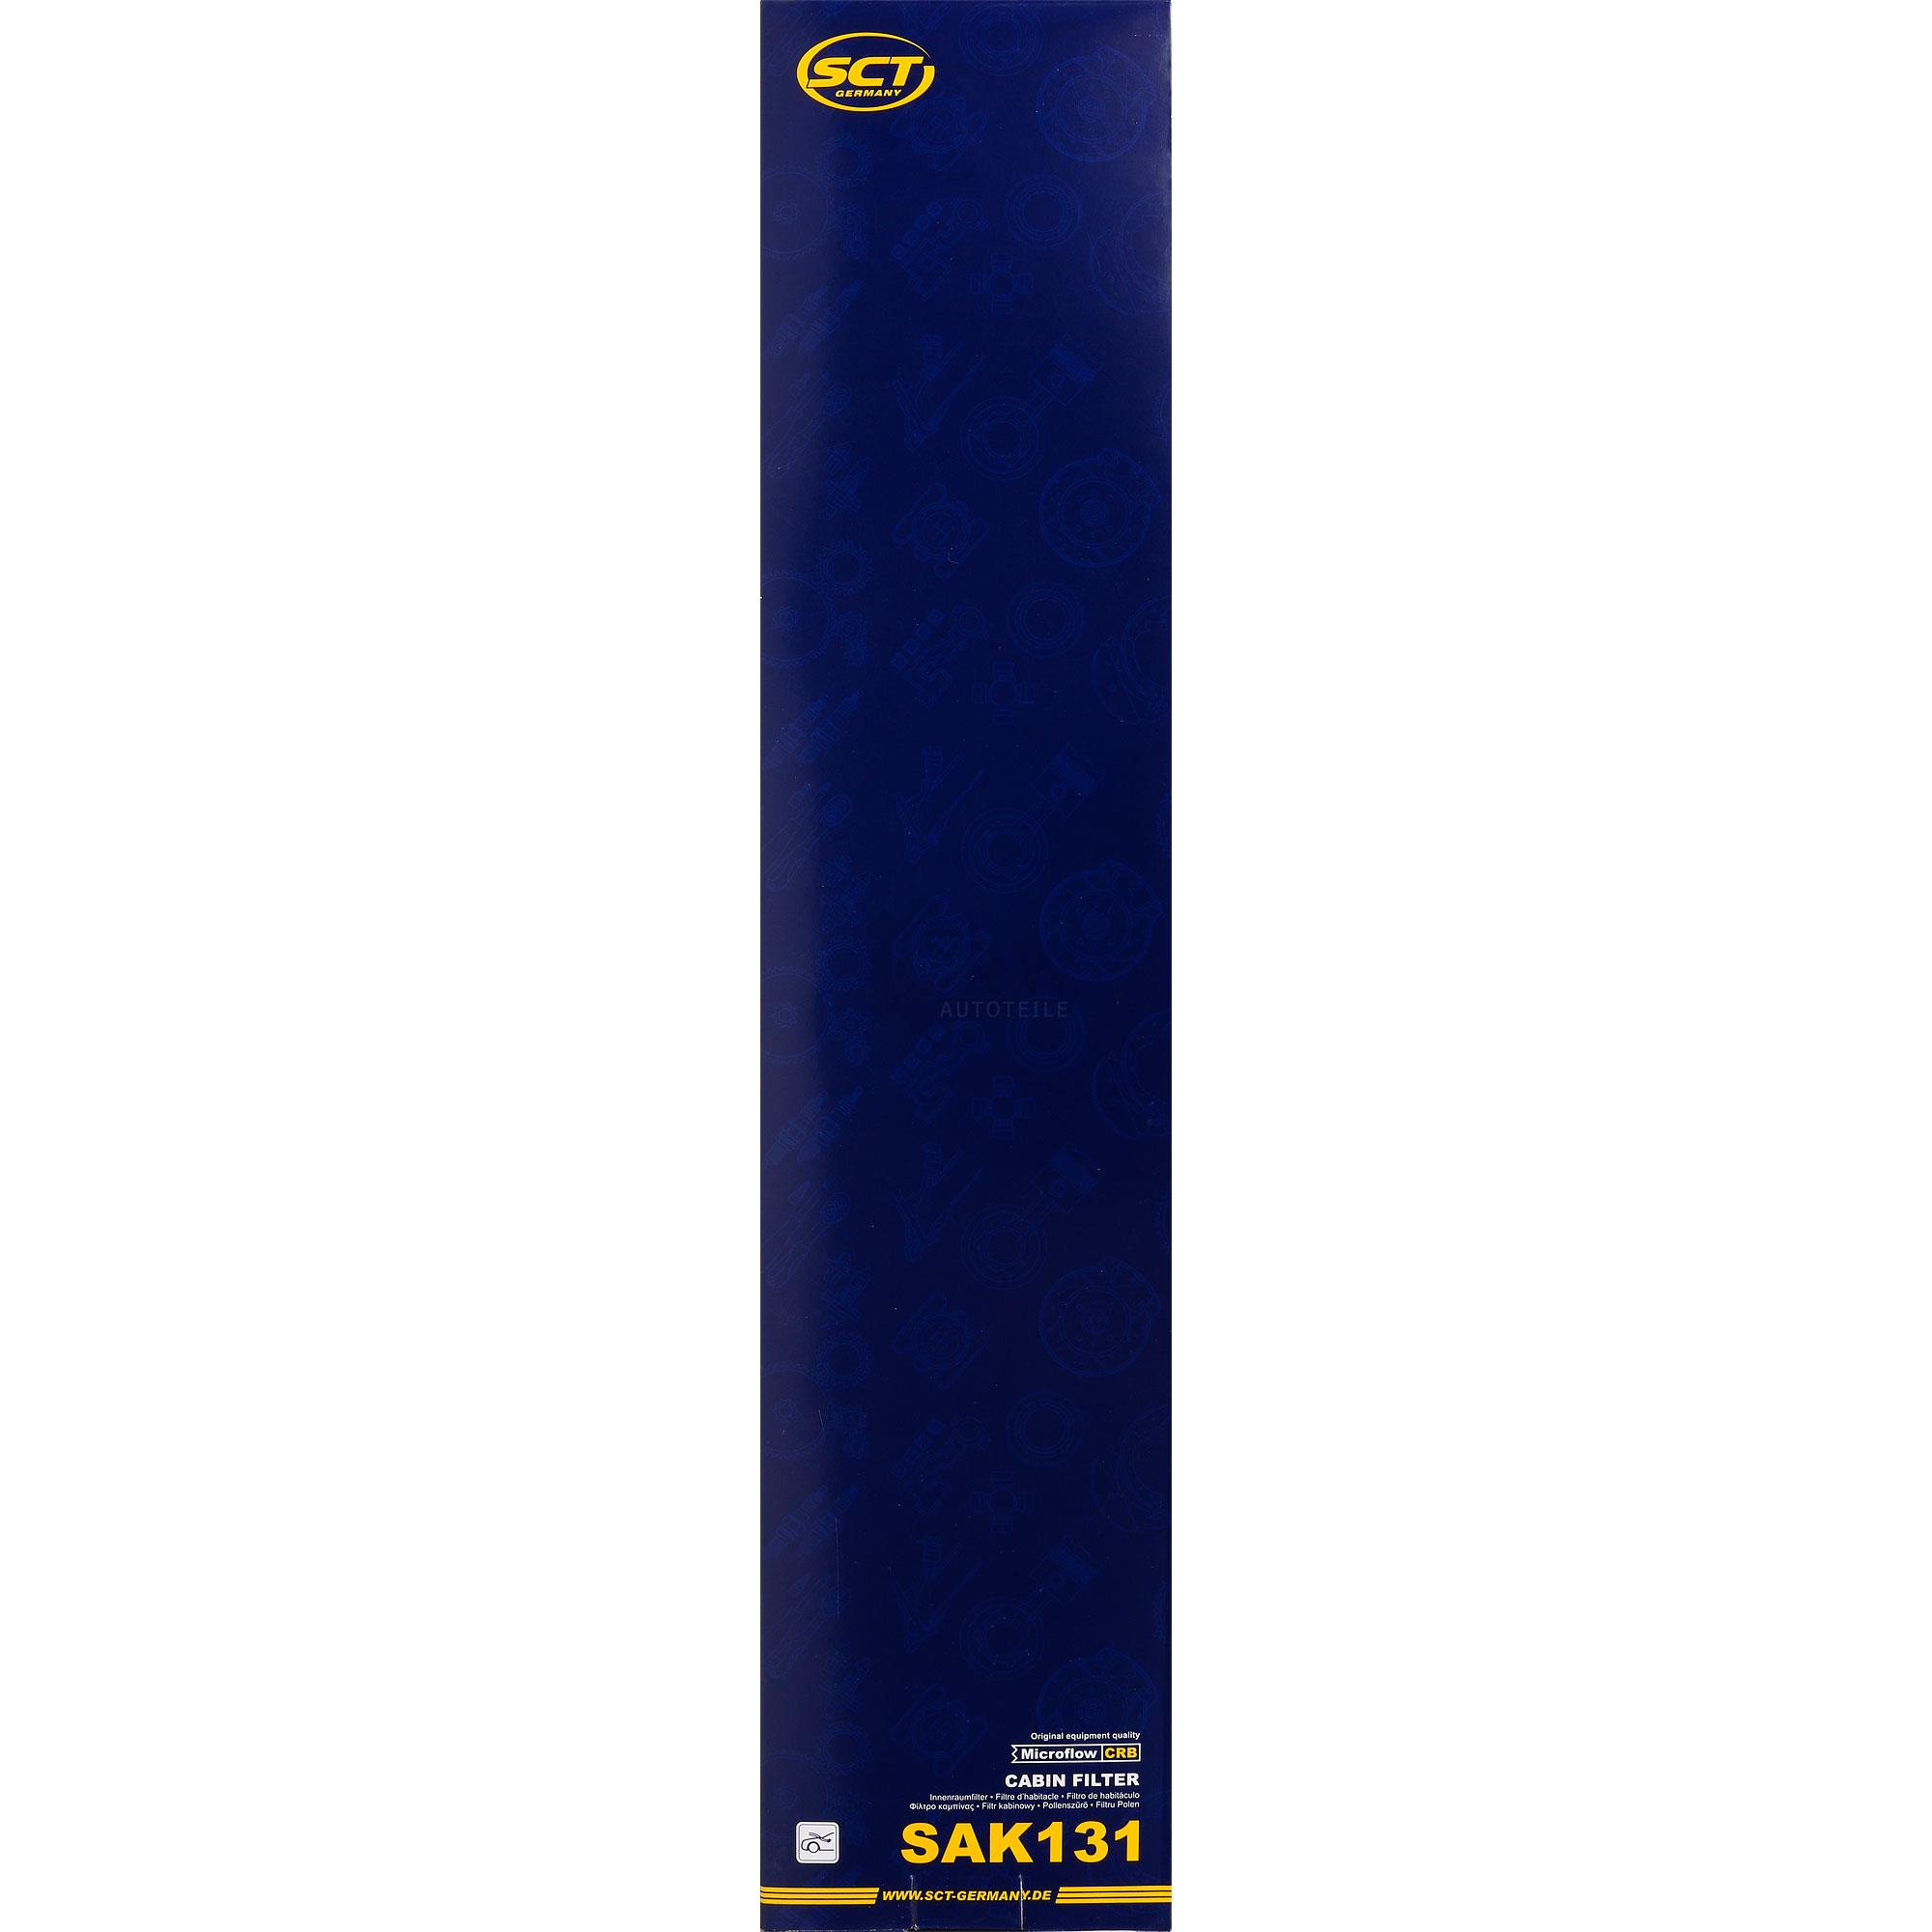 Oil-Change-Set-5L-Mannol-Classic-10w-40-Engine-Oil-Sct-Filter-Kit-10135097